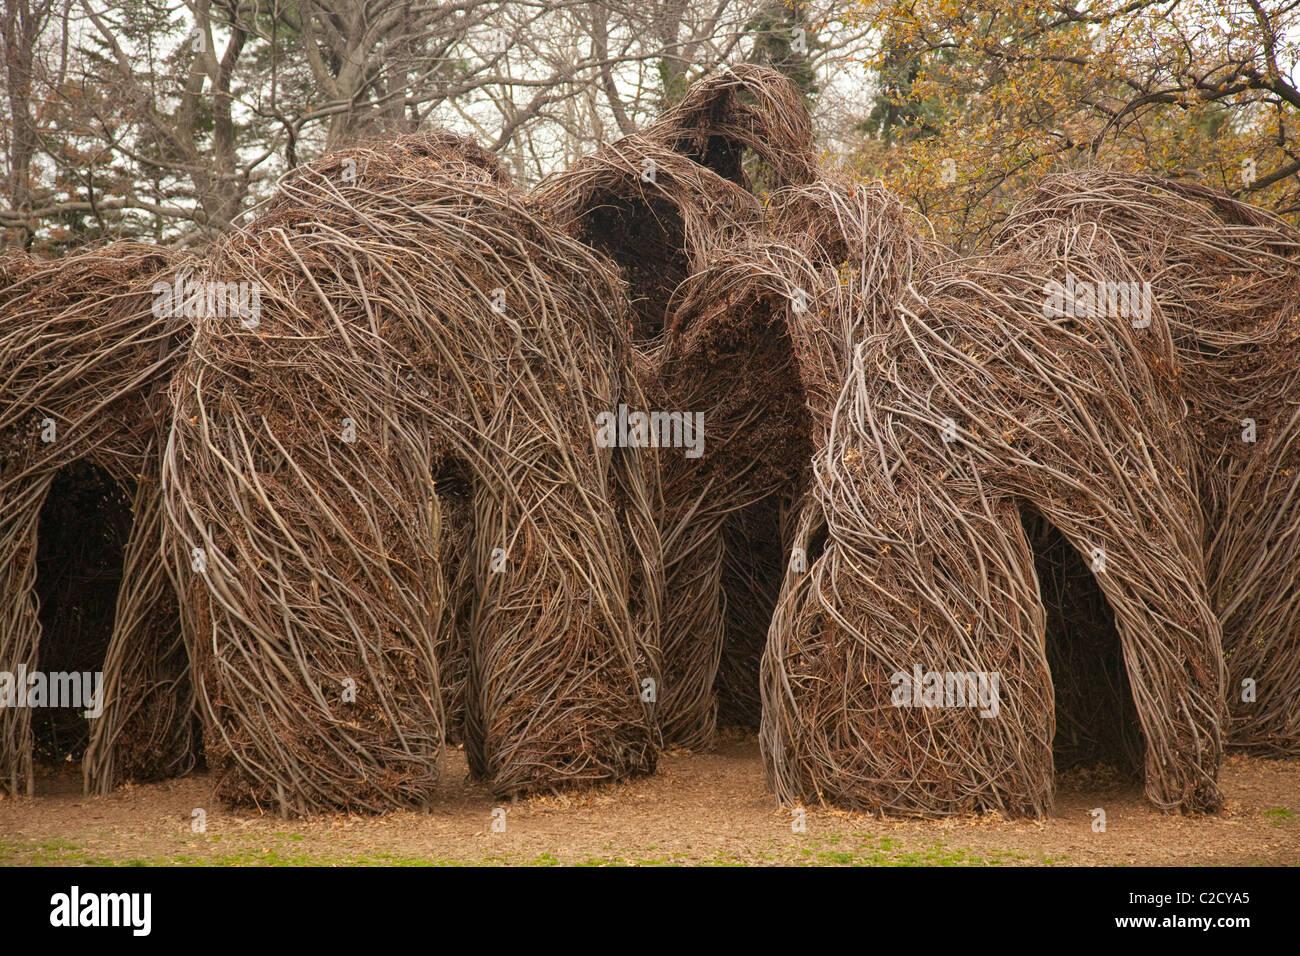 Willow Shelter Sculpture Stock Photos & Willow Shelter Sculpture ...